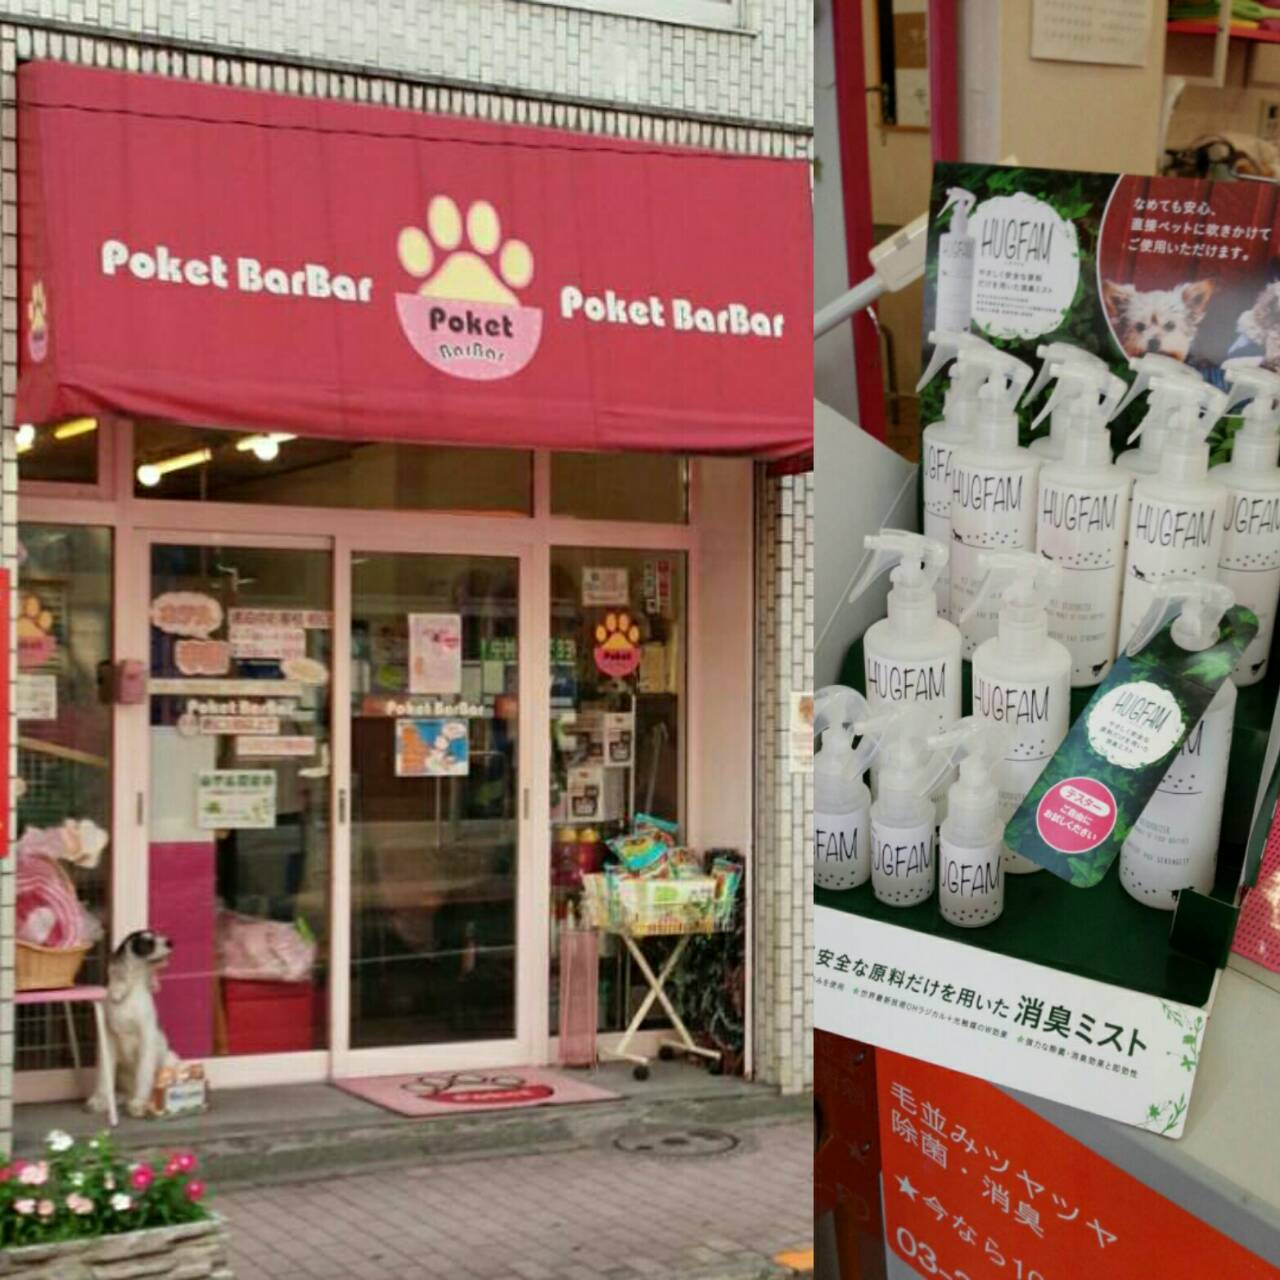 HUGFAM店頭販売情報/Pocket BarBar